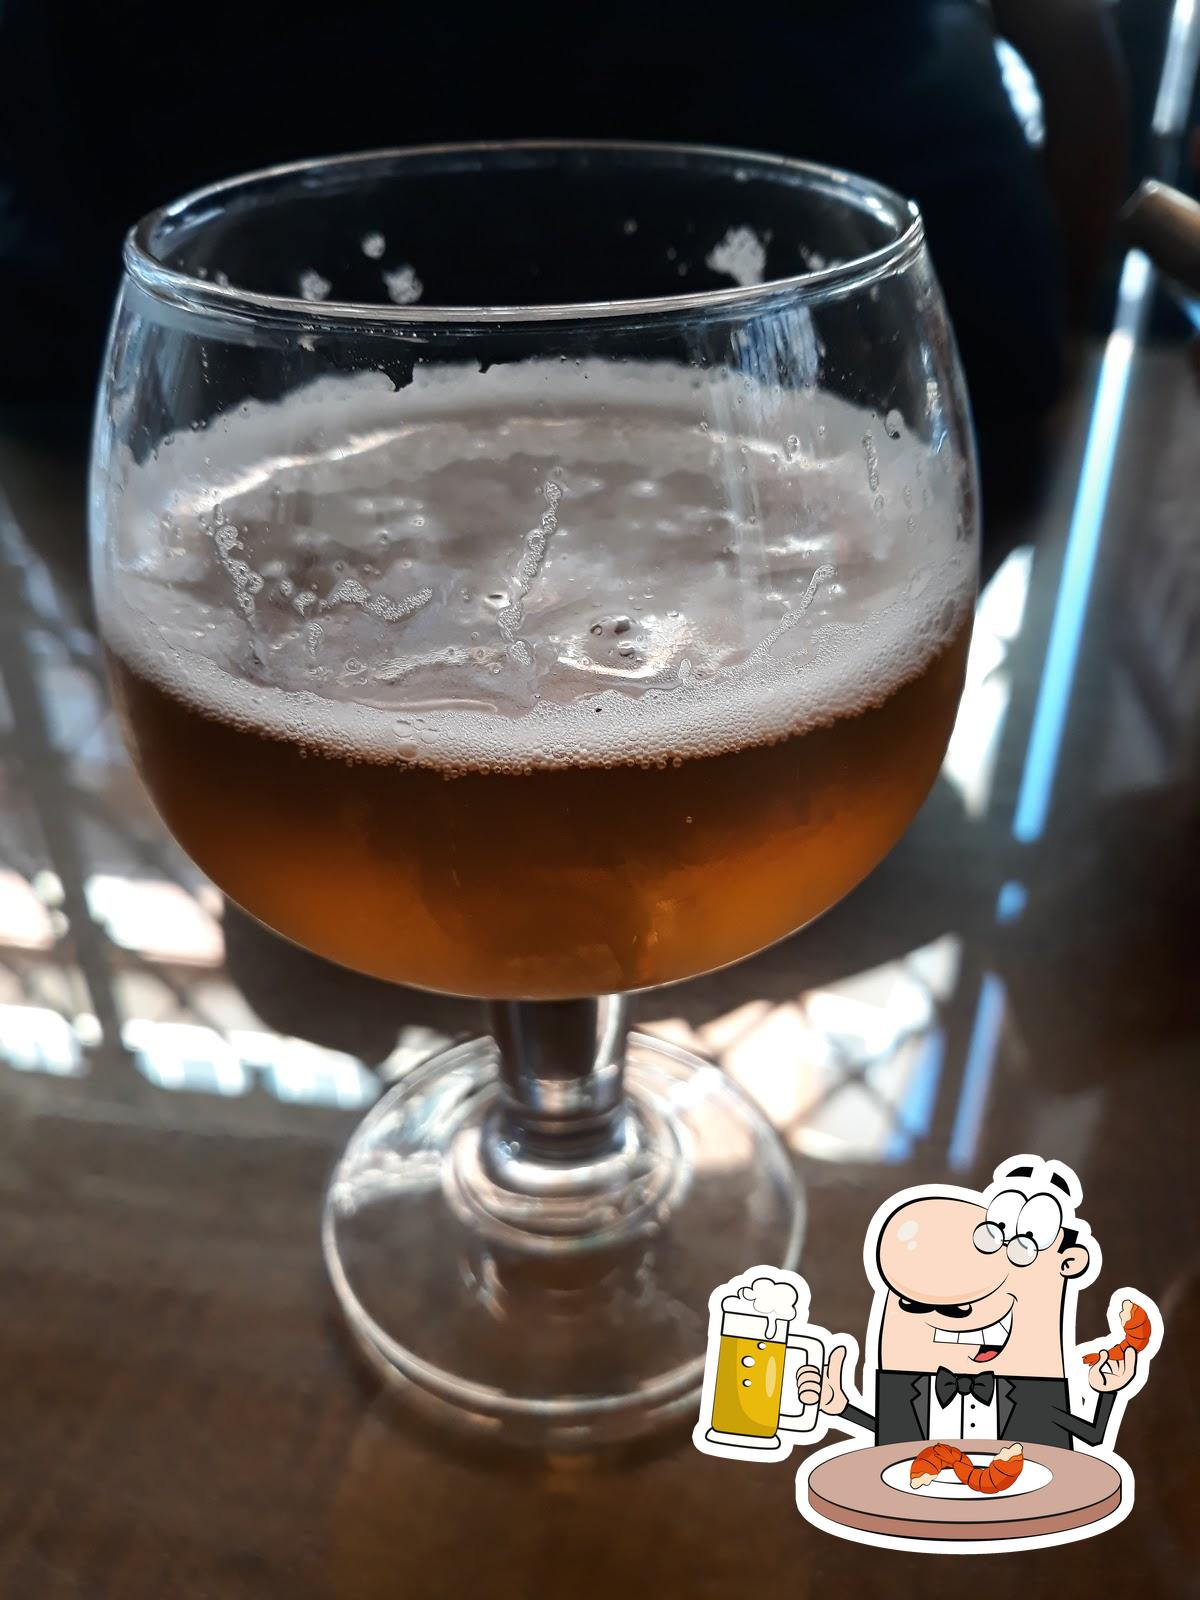 Bar ViVas tiene distintas cervezas